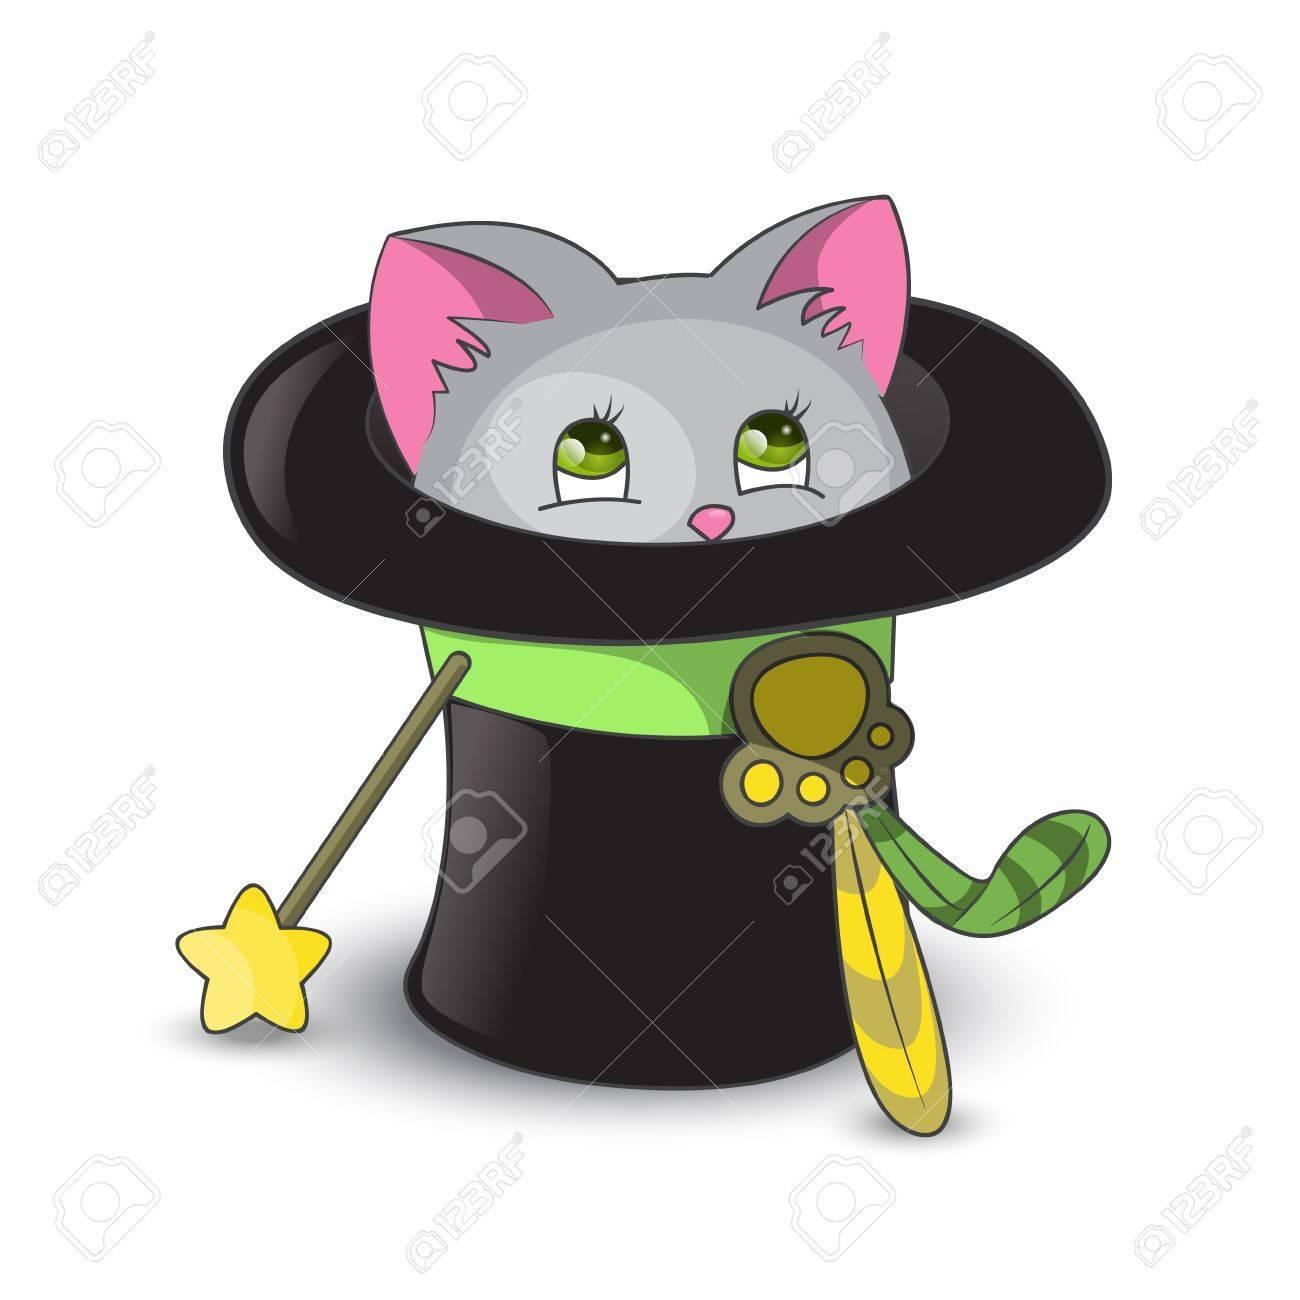 Cat in a hat clipart 4 » Clipart Portal.